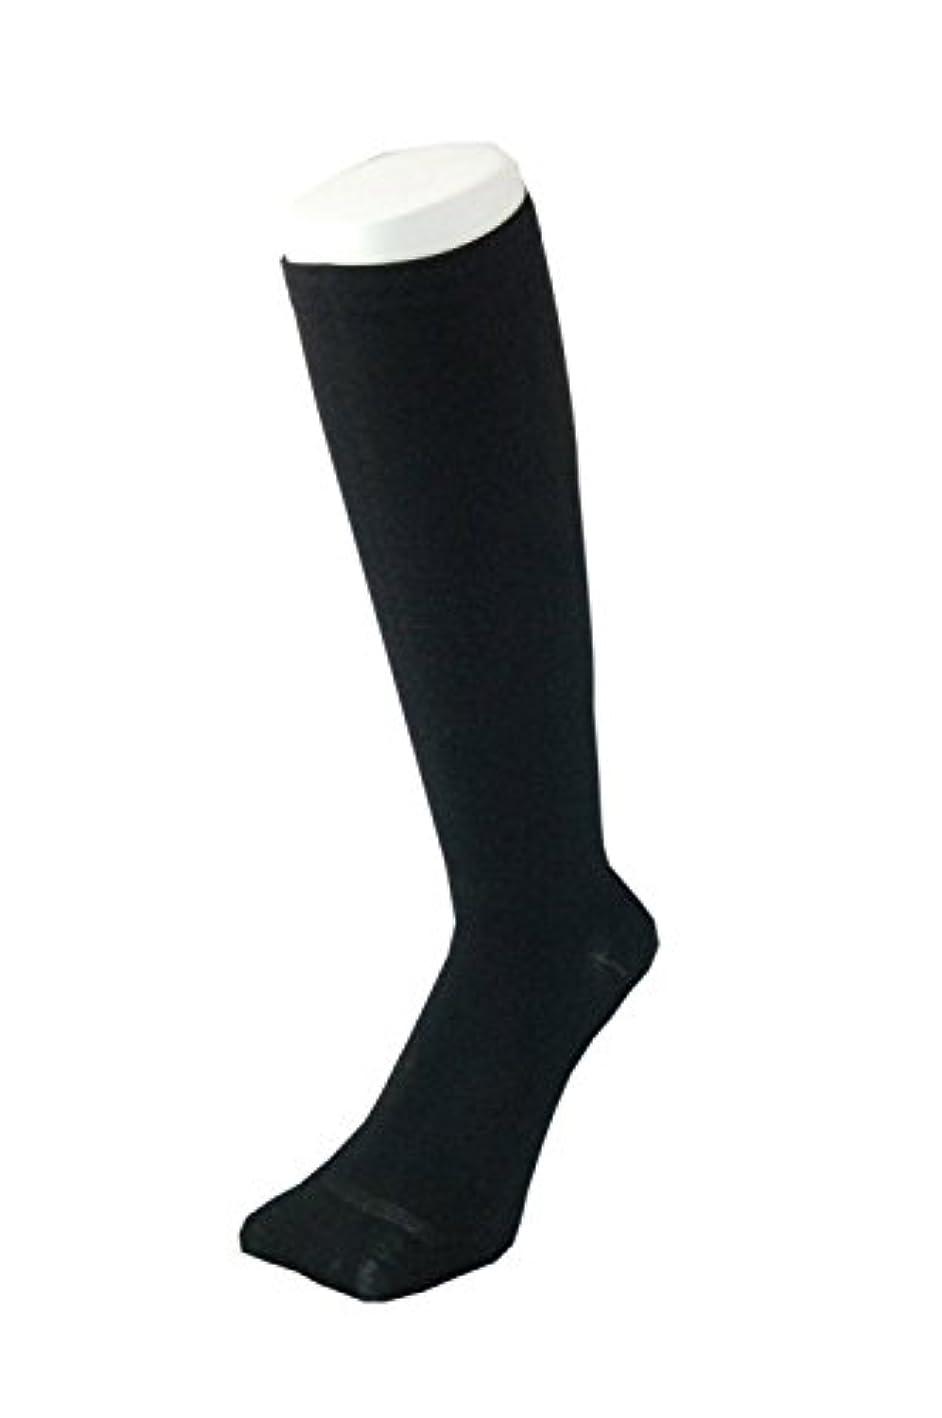 PAX-ASIAN 紳士?メンズ 着圧靴下 (25~27cm ) ムクミ解消 締め付け サポート 抗菌 ソックス 黒色?ブラック 3足組